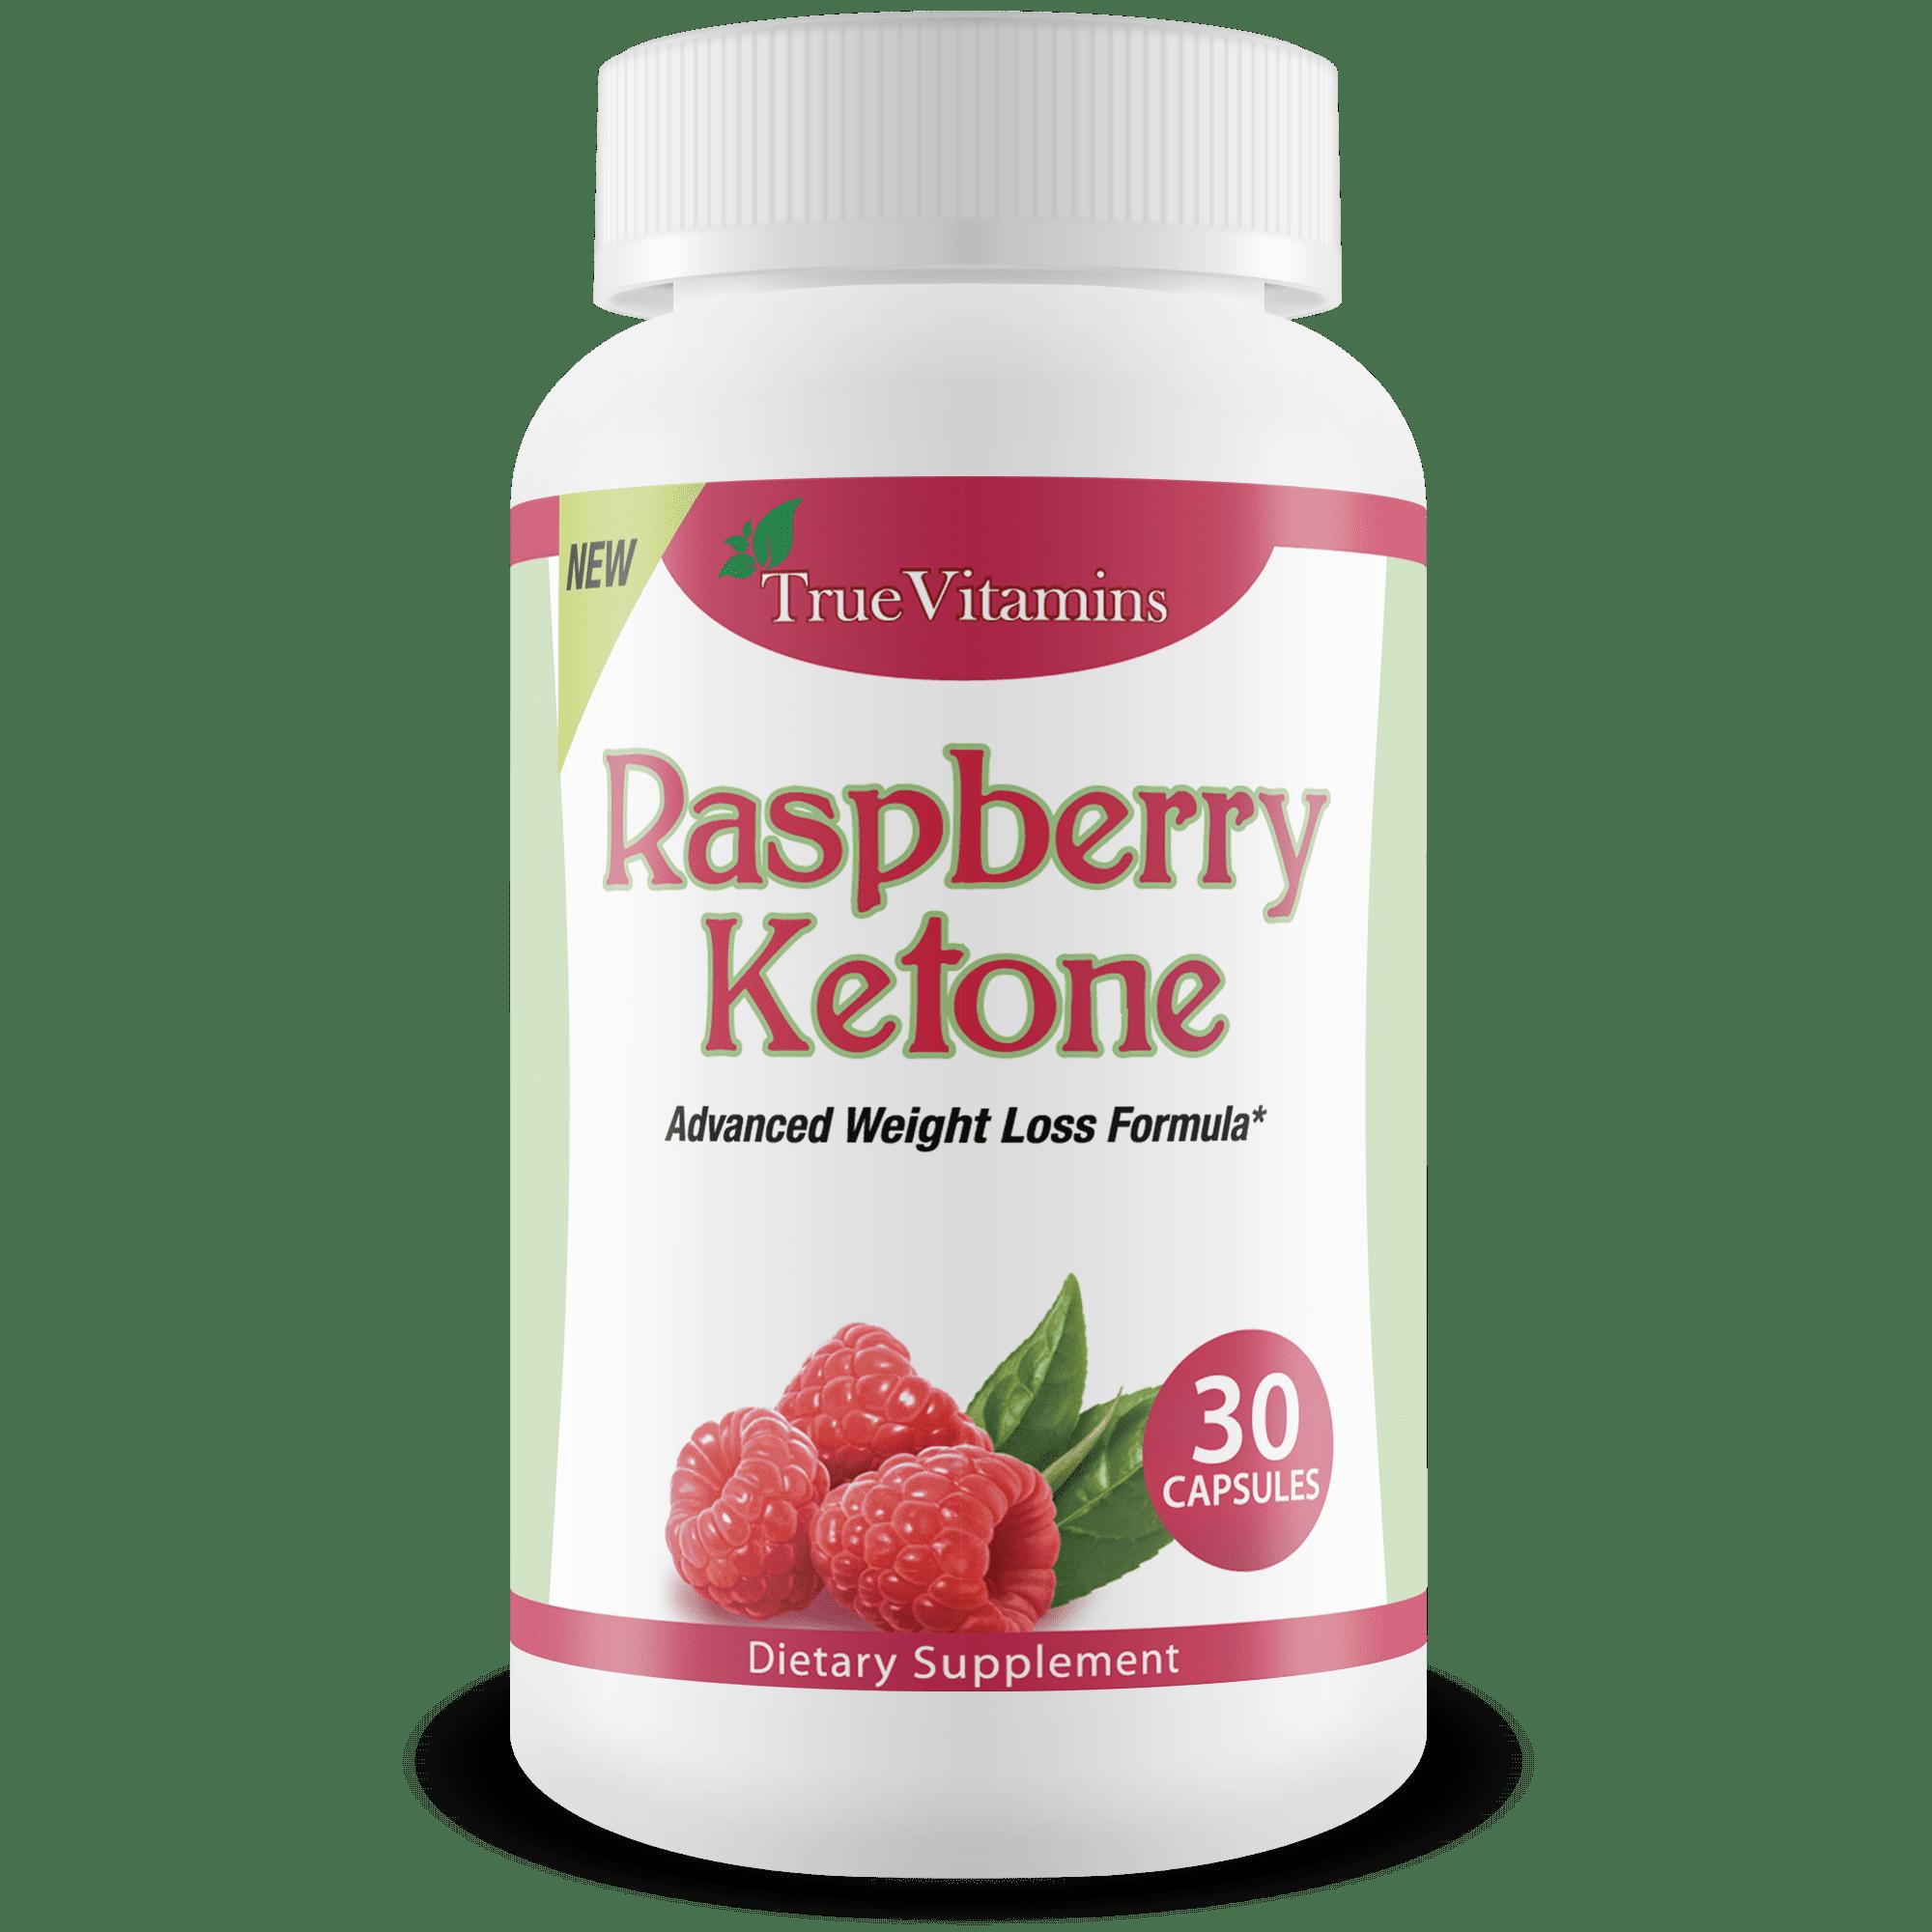 True Vitamins Raspberry Ketones All Natural Weight Loss